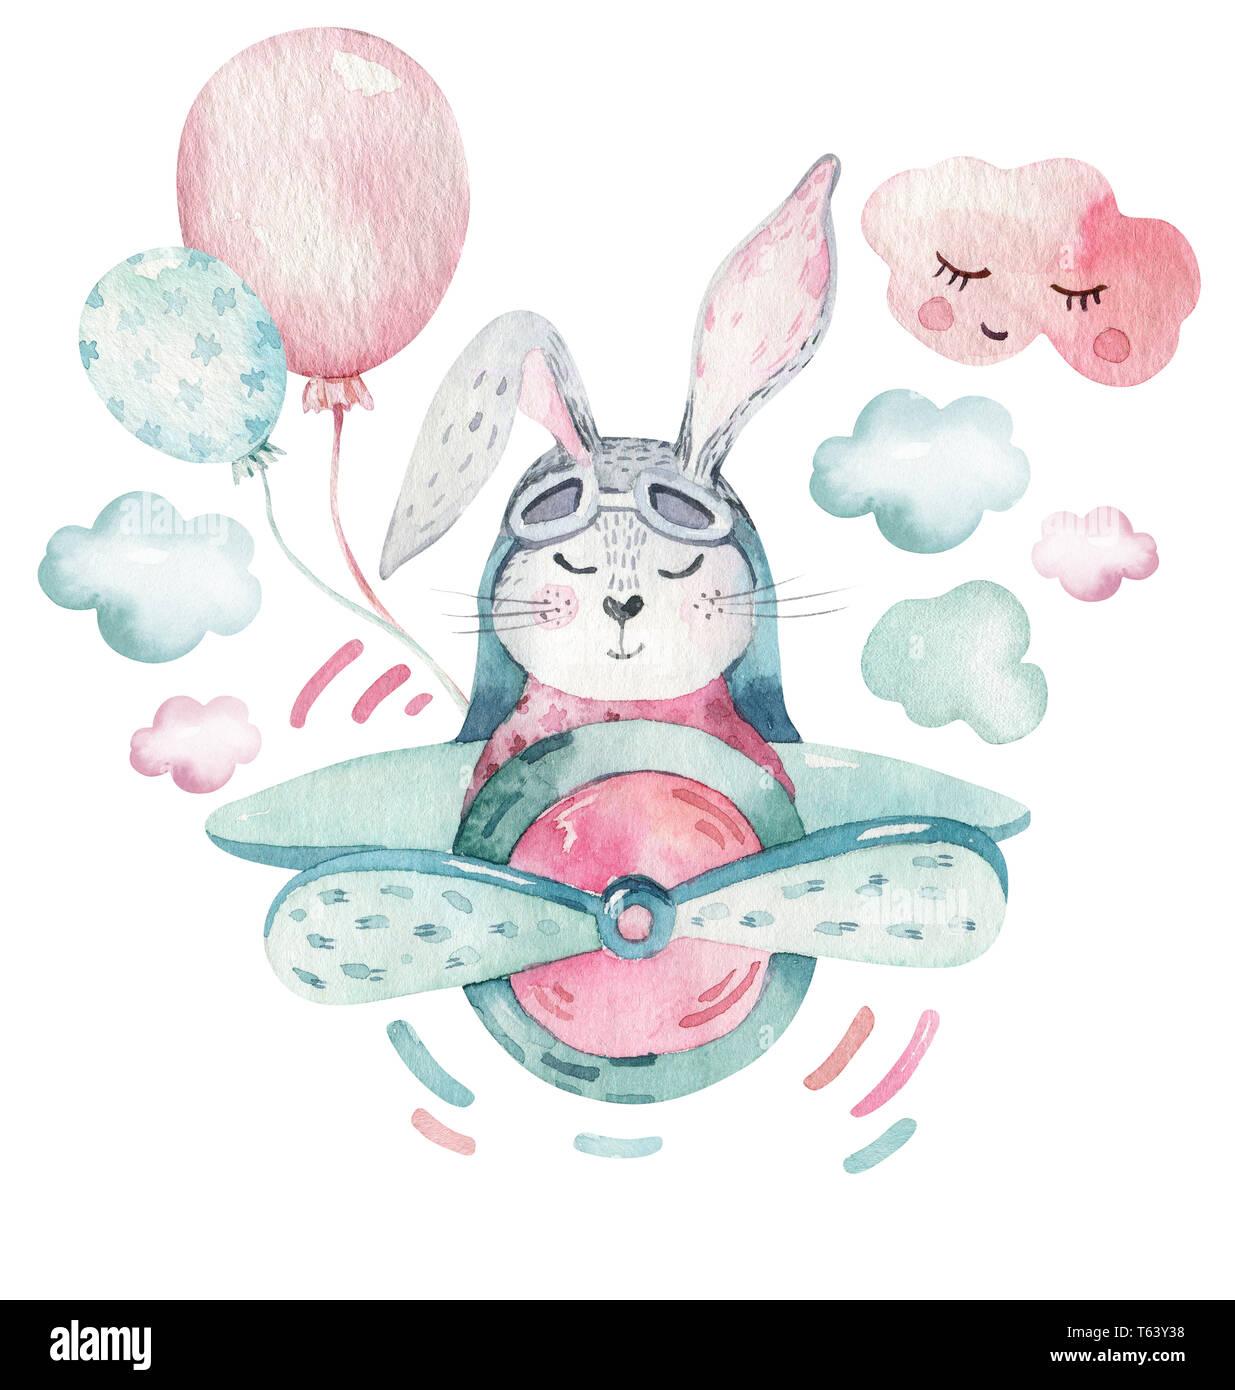 Hand Drawing Fly Cute Easter Pilot Bunny Watercolor Cartoon